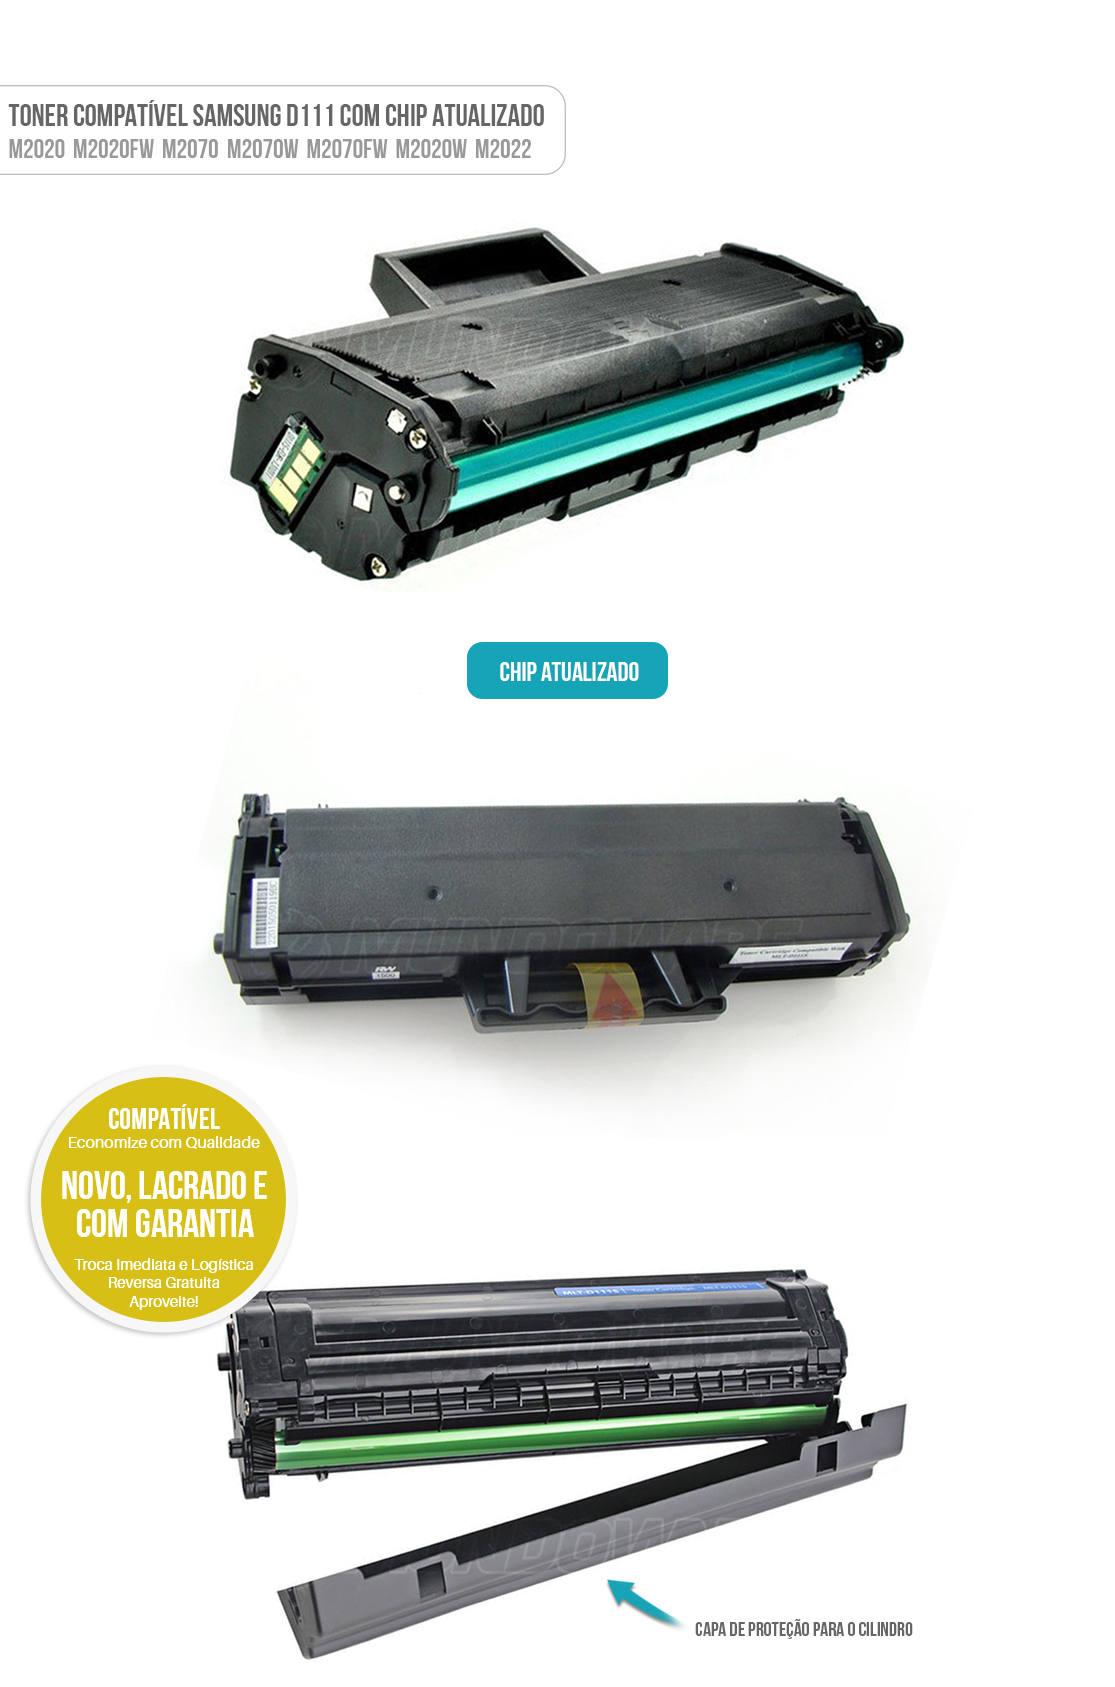 Toner D111S D111E D111 com Chip Atualizado para Xpress M2020 M2020W M2020FW M2022 M2070 M2070W M2070FW Tonner